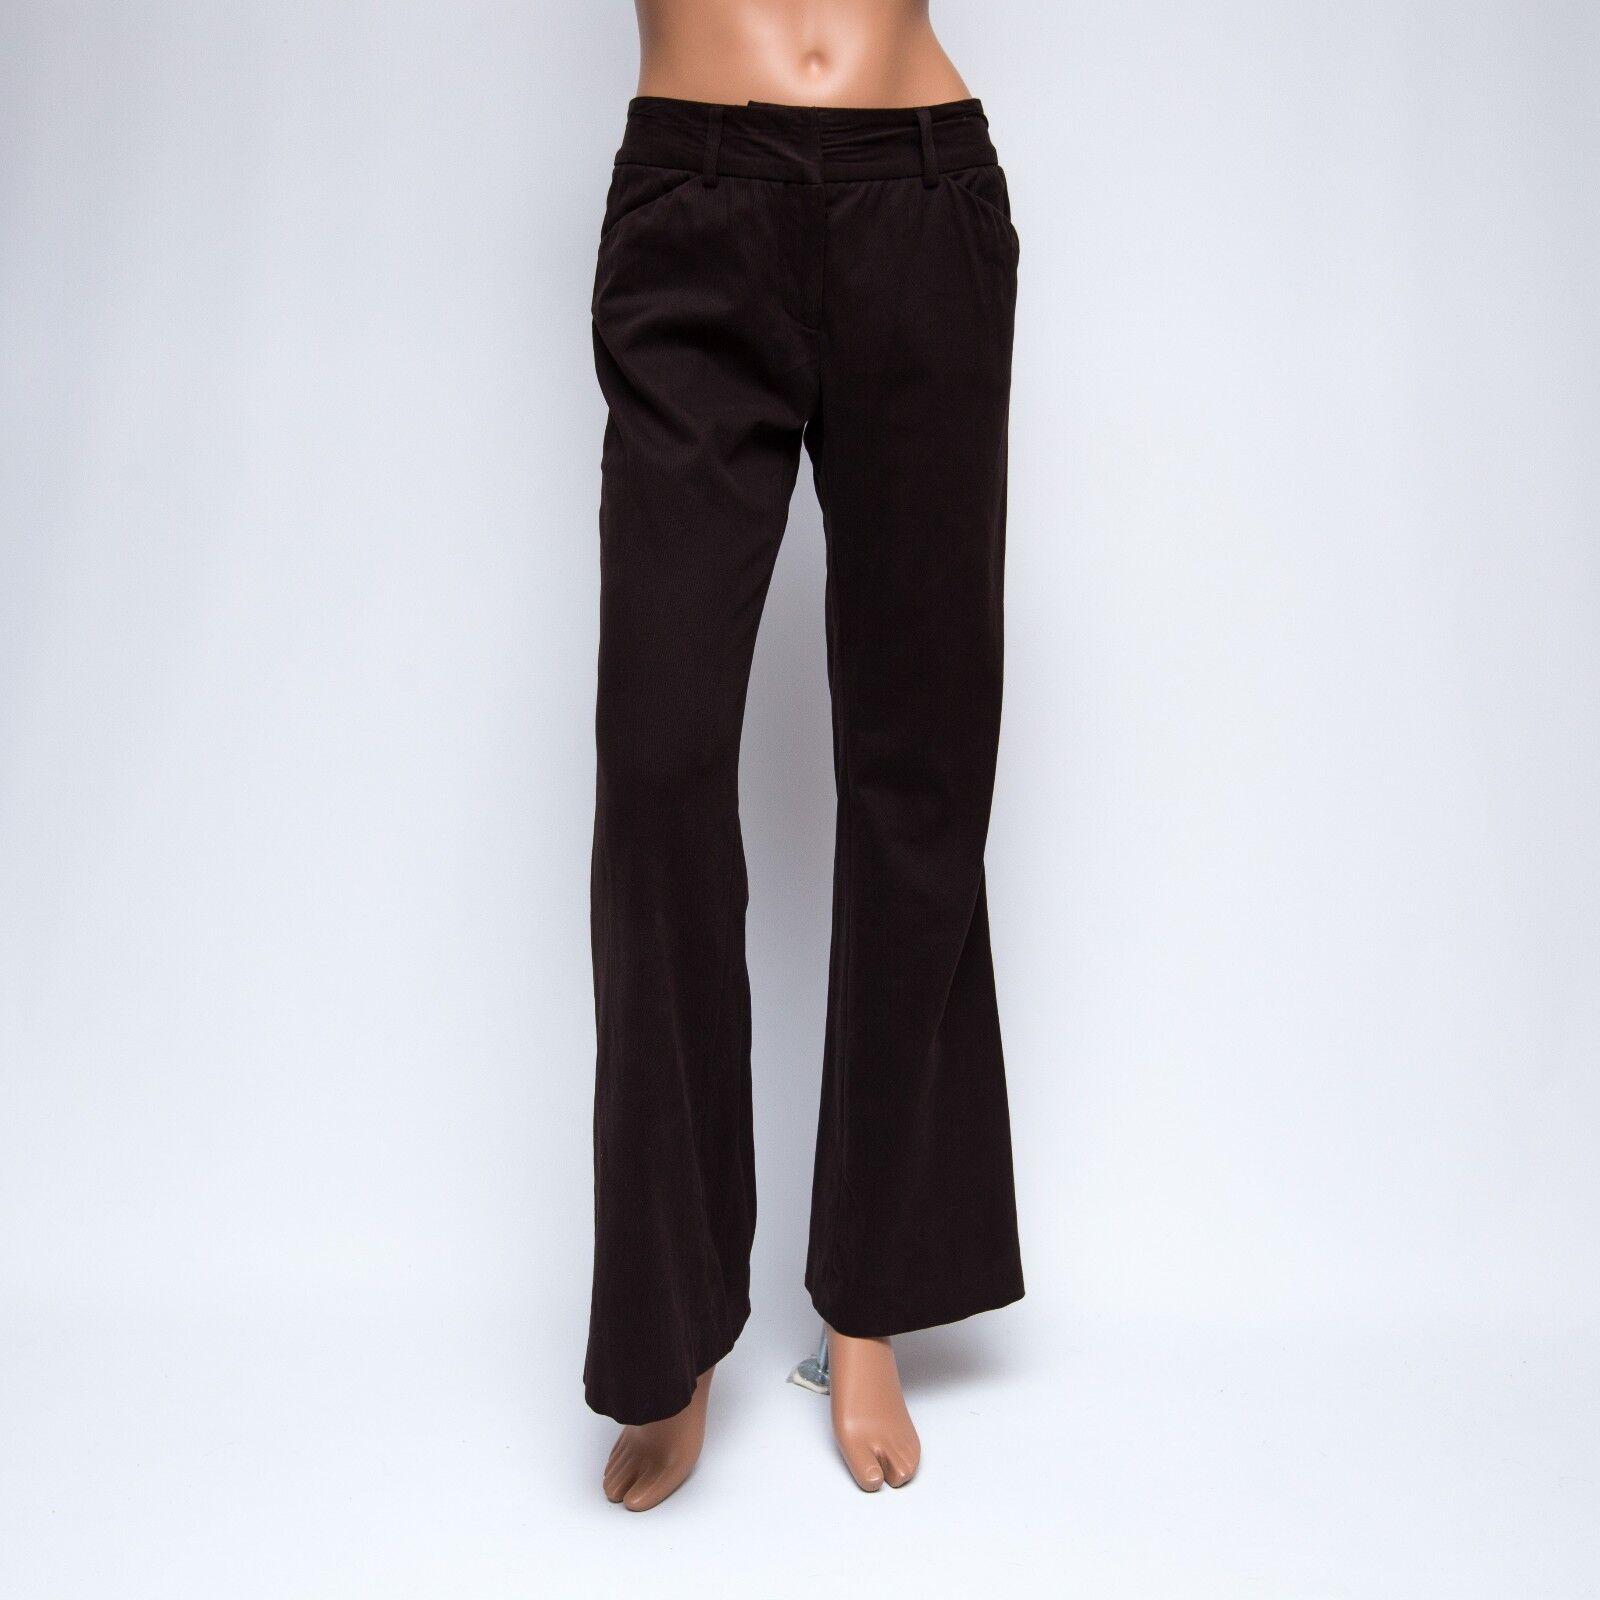 Shin Choi 2x31 braun Mid-weight Flarot Pants  245